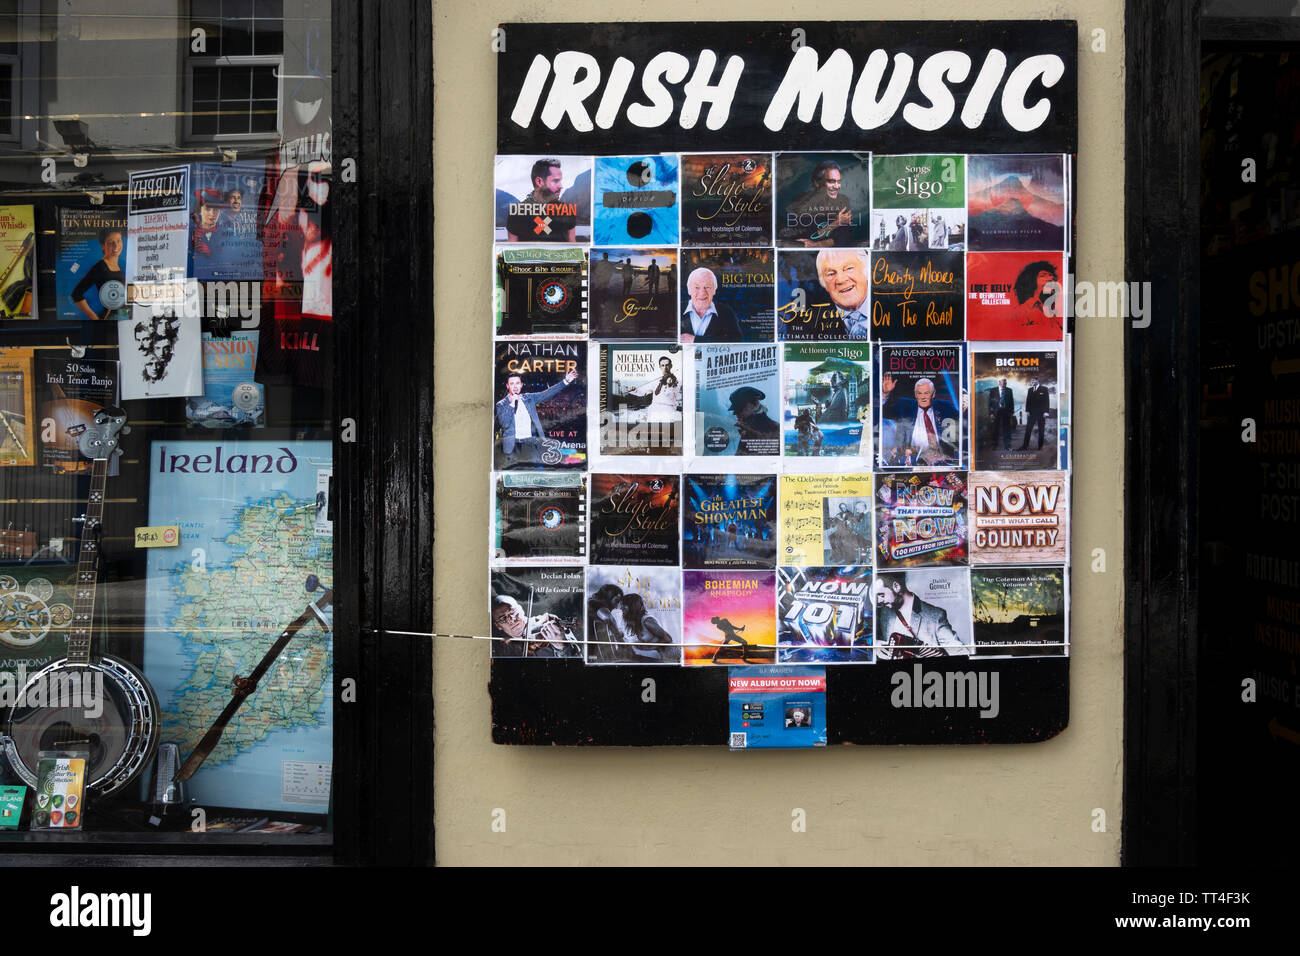 The Record Room shop specializing in traditional Irish music in Sligo, Ireland - Stock Image